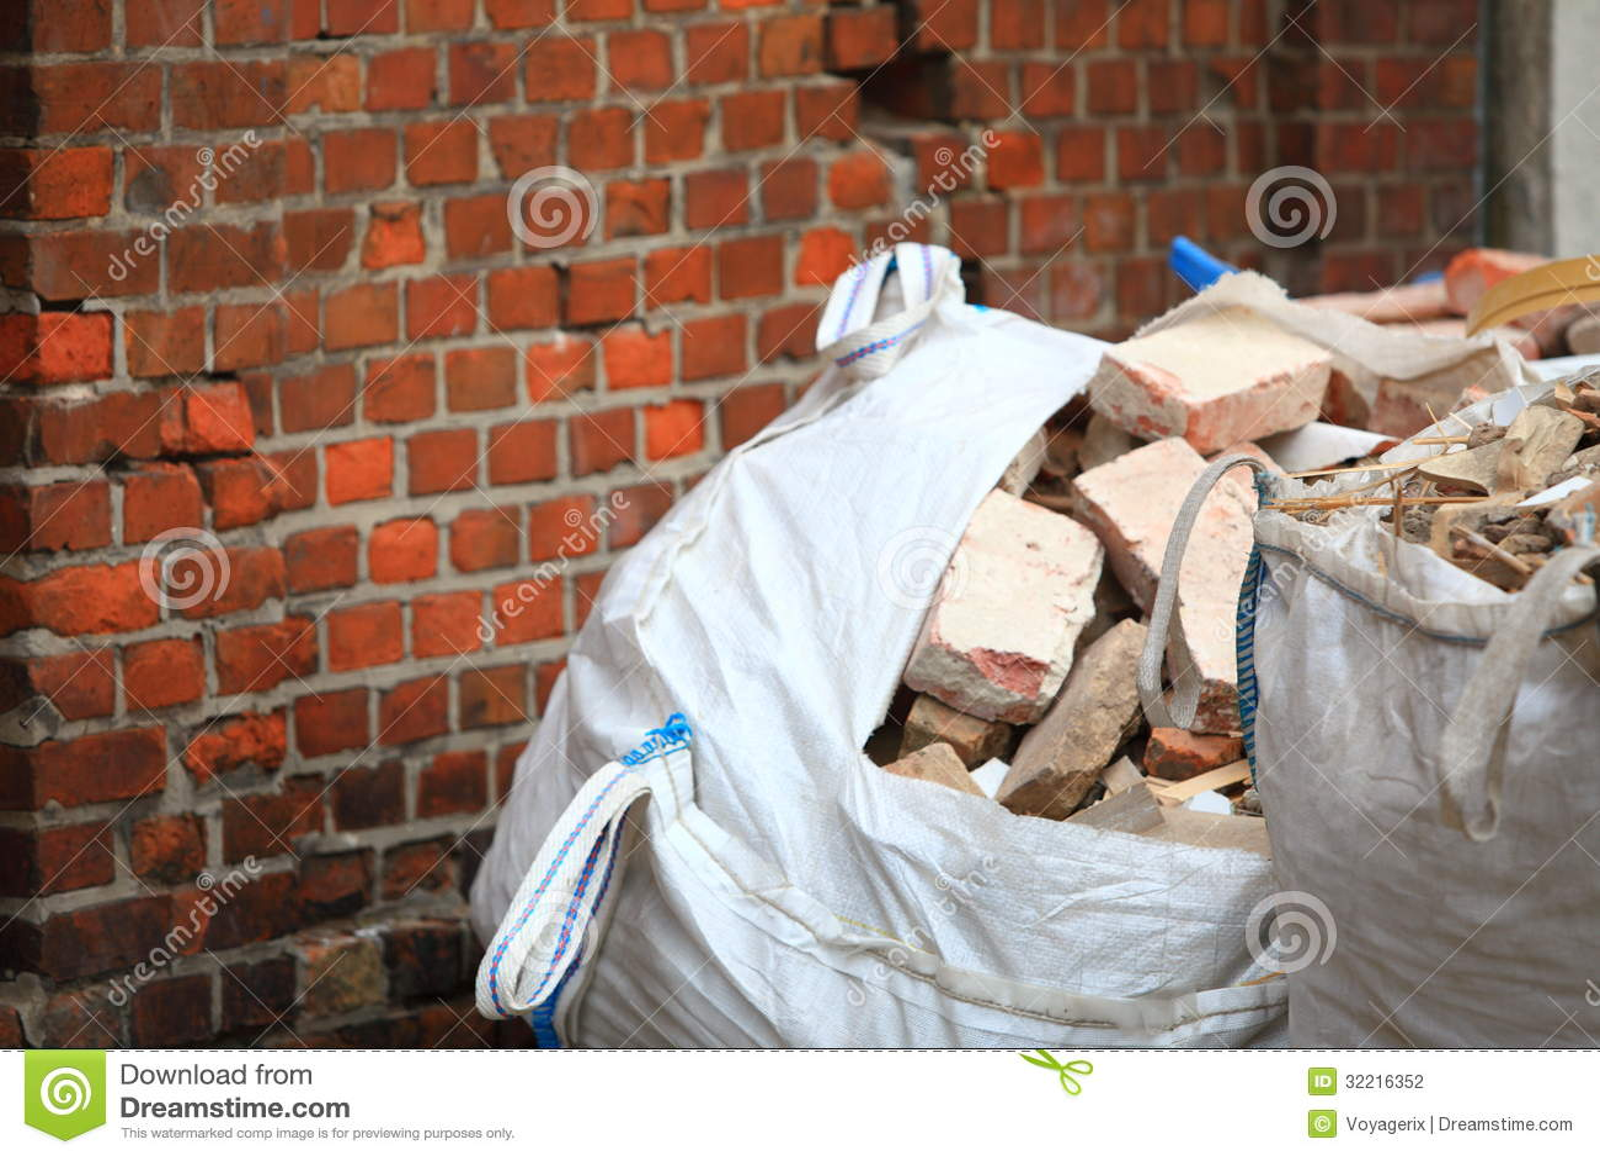 how to make rubble debris pile maya